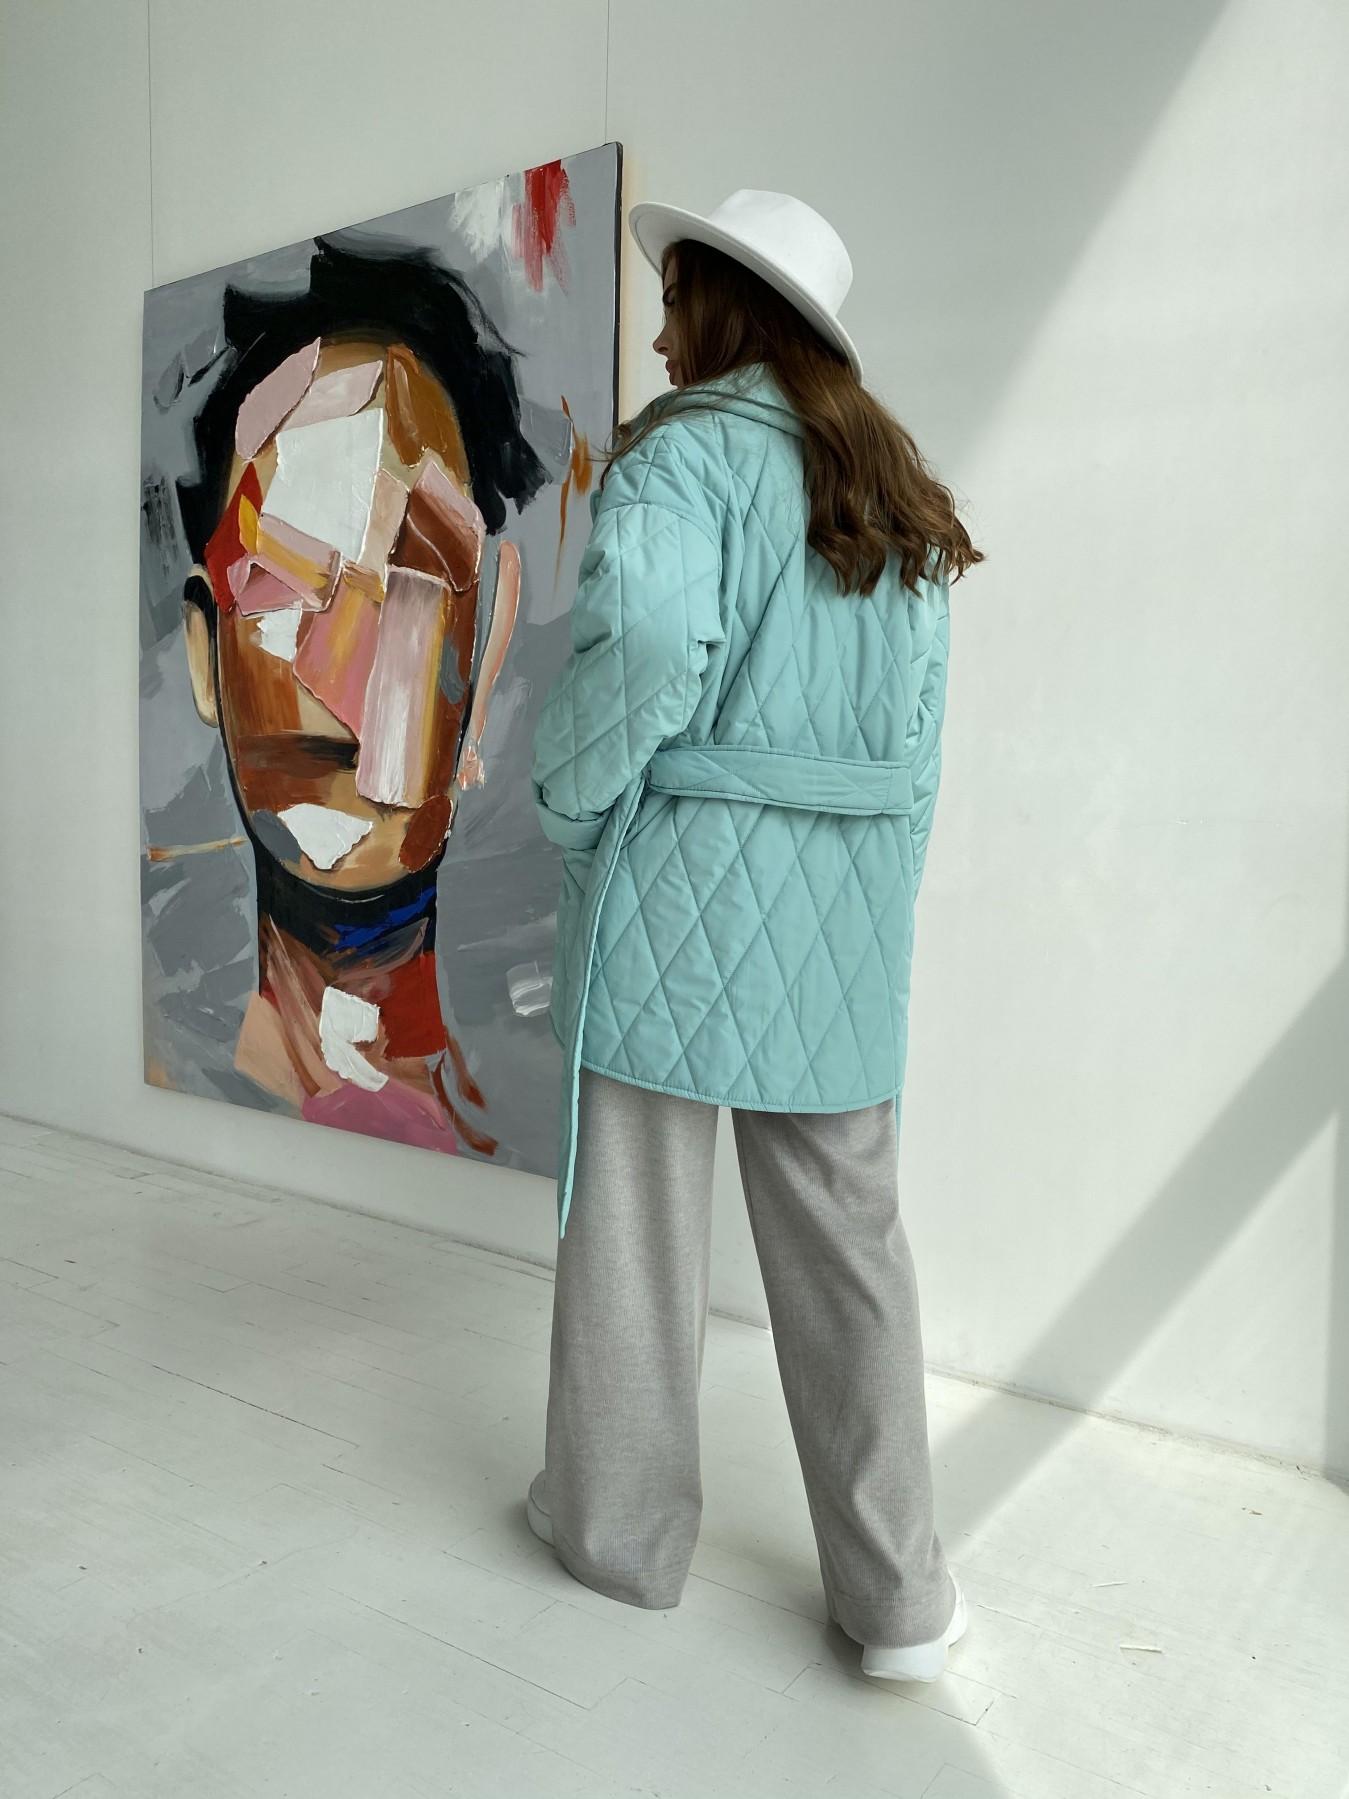 Норд стеганая куртка из плащеки 11770  АРТ. 48511 Цвет: Олива 2 - фото 3, интернет магазин tm-modus.ru